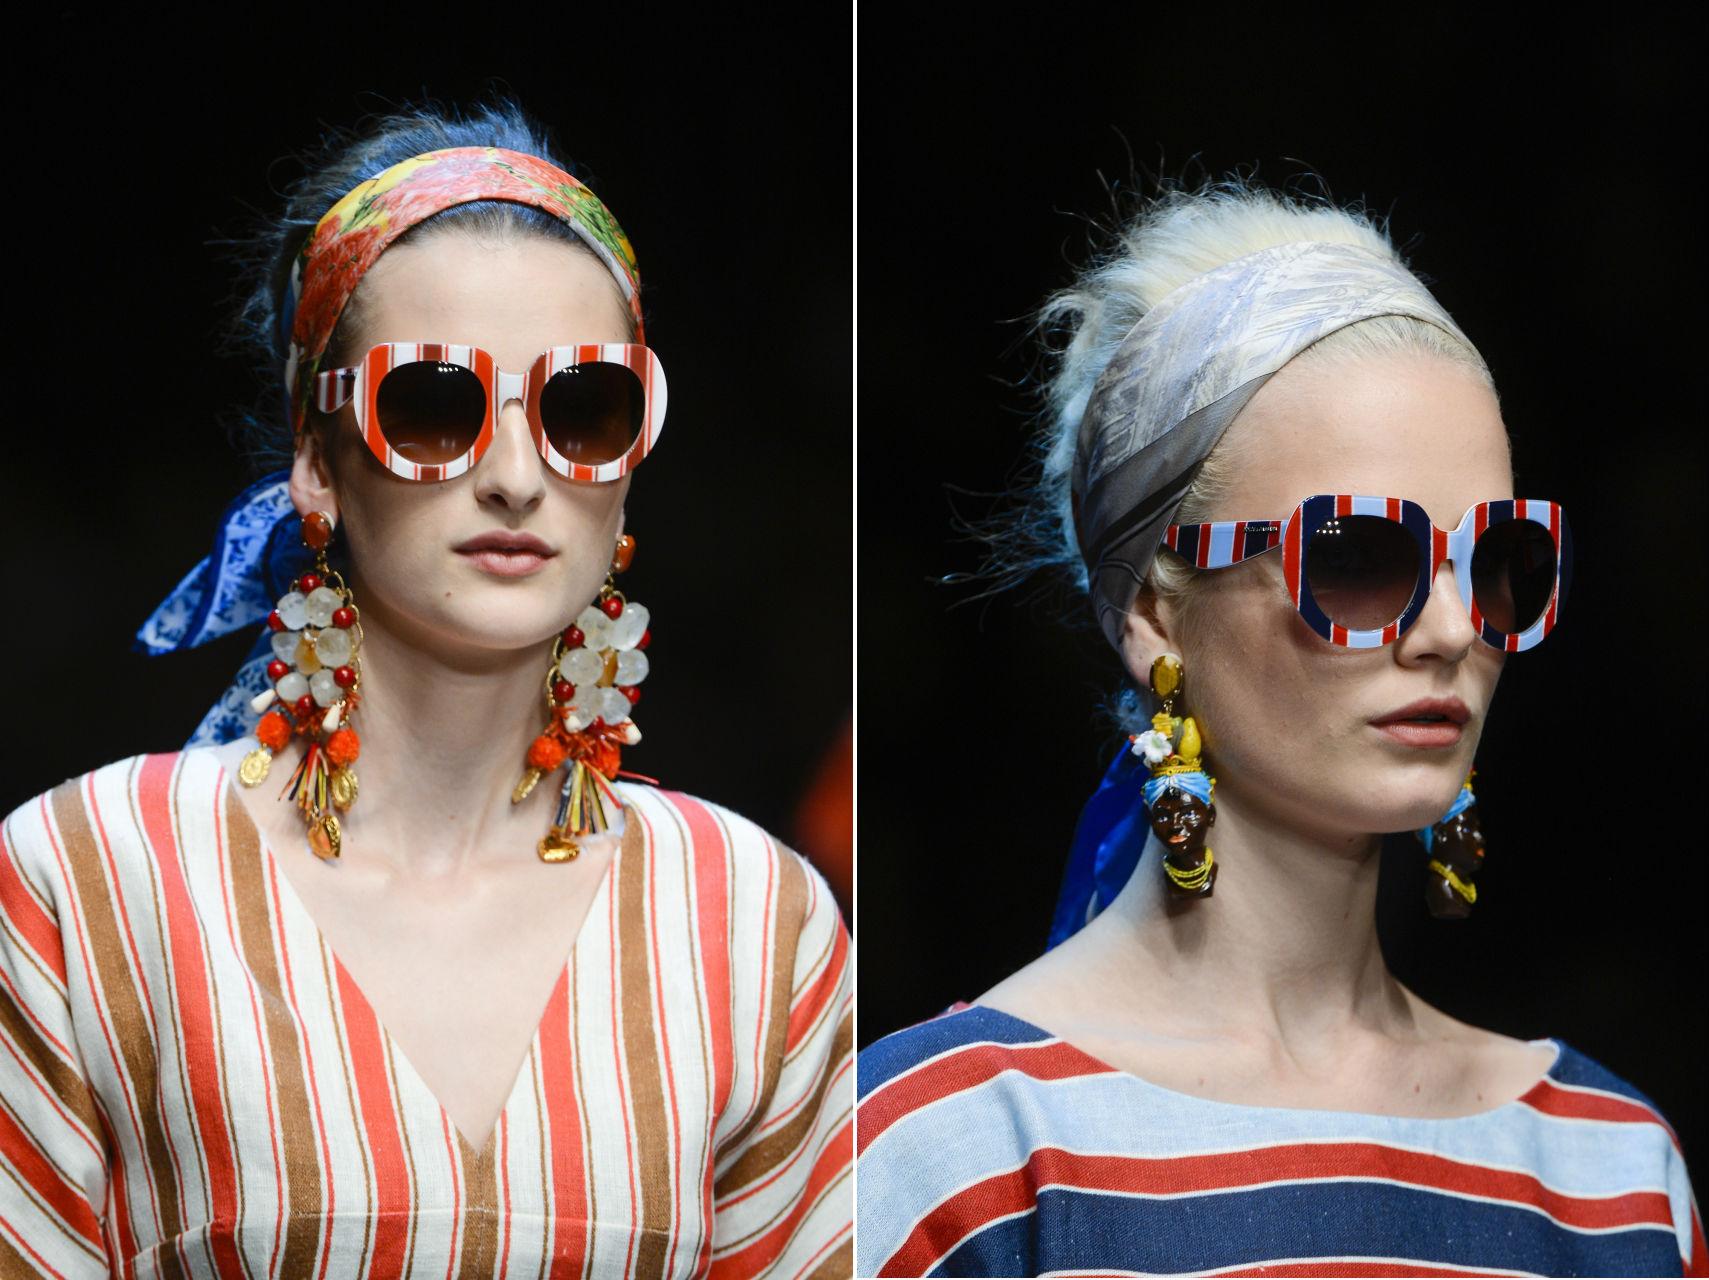 c361c8aee851 Dolce Gabbana » Мода 2013-2015 - фото, тенденции, дизайнеры, бренды ...